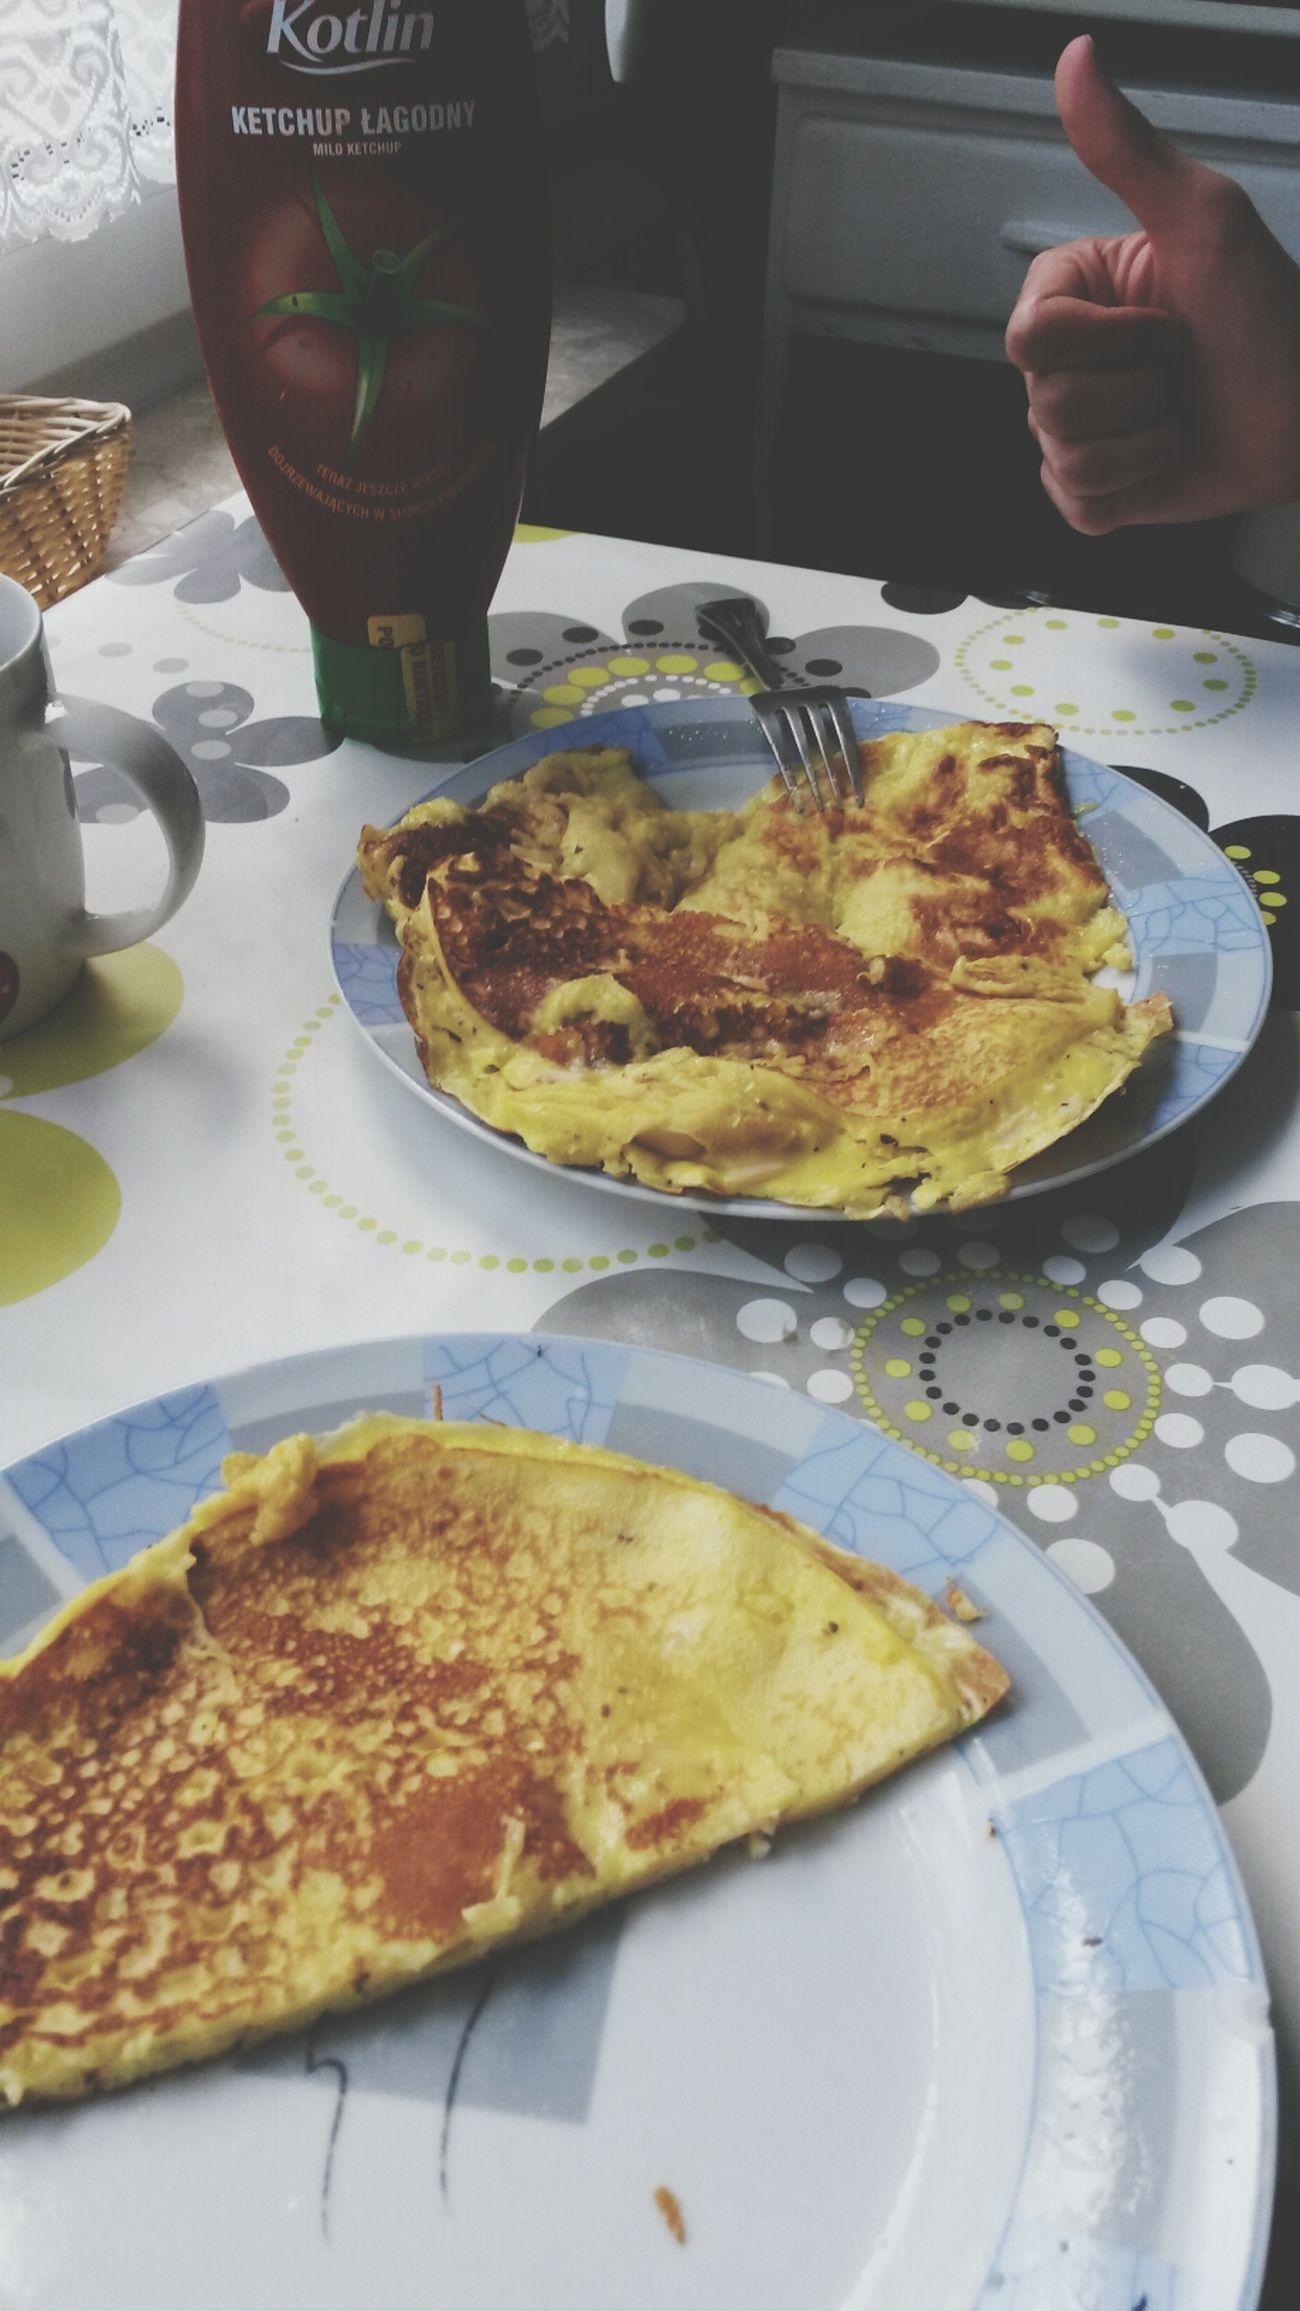 Sniadaniemistrzow Omlet Yummy Hahaha